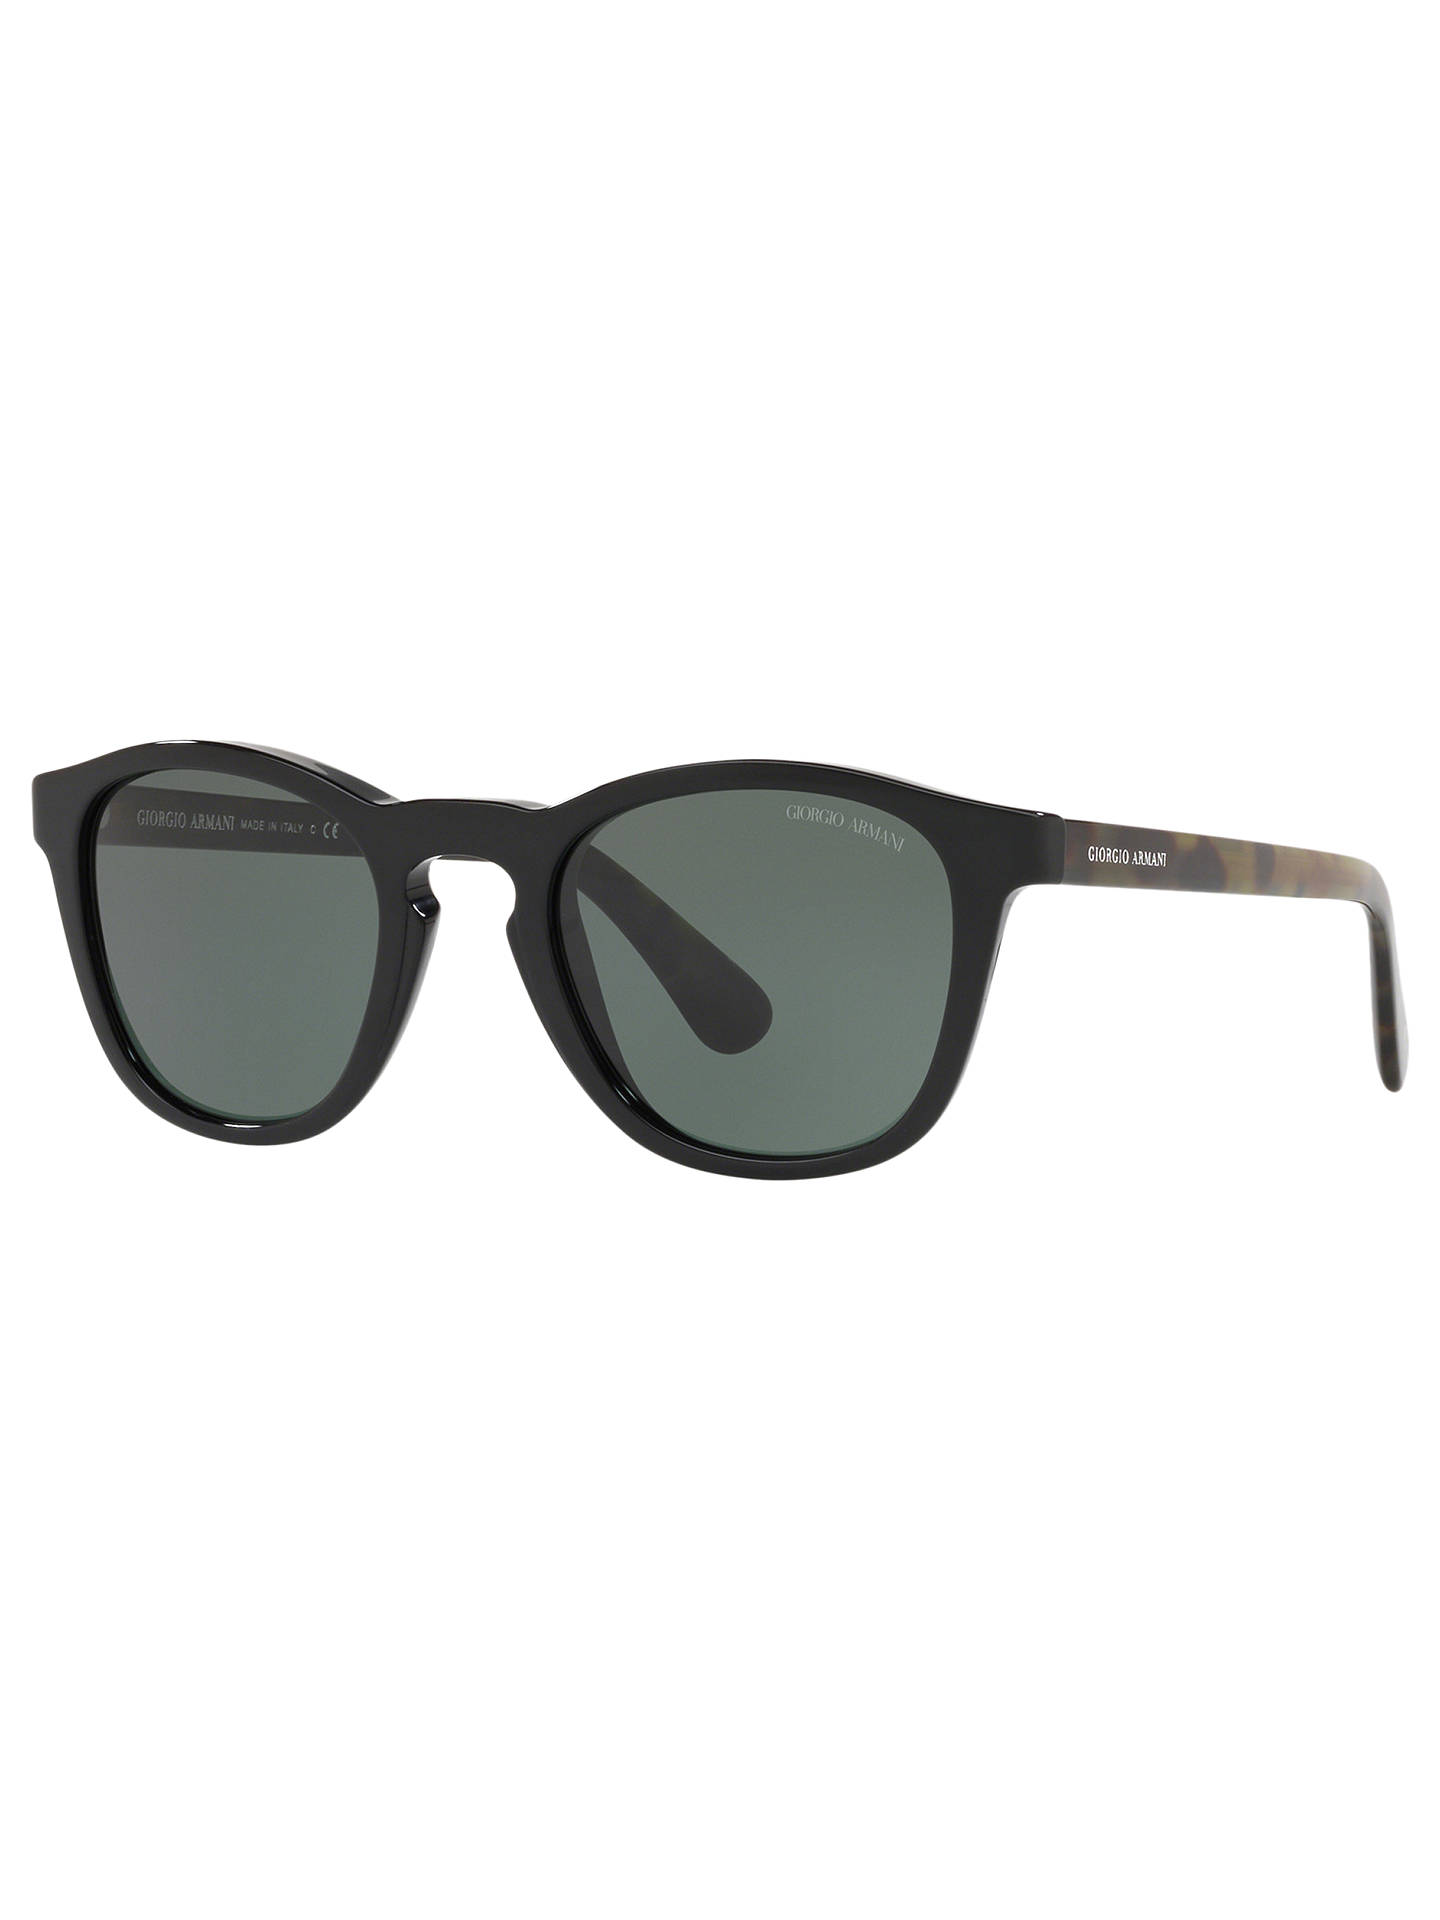 bcc28bb6b01b Giorgio Armani AR8112 Men s D-Frame Sunglasses at John Lewis   Partners